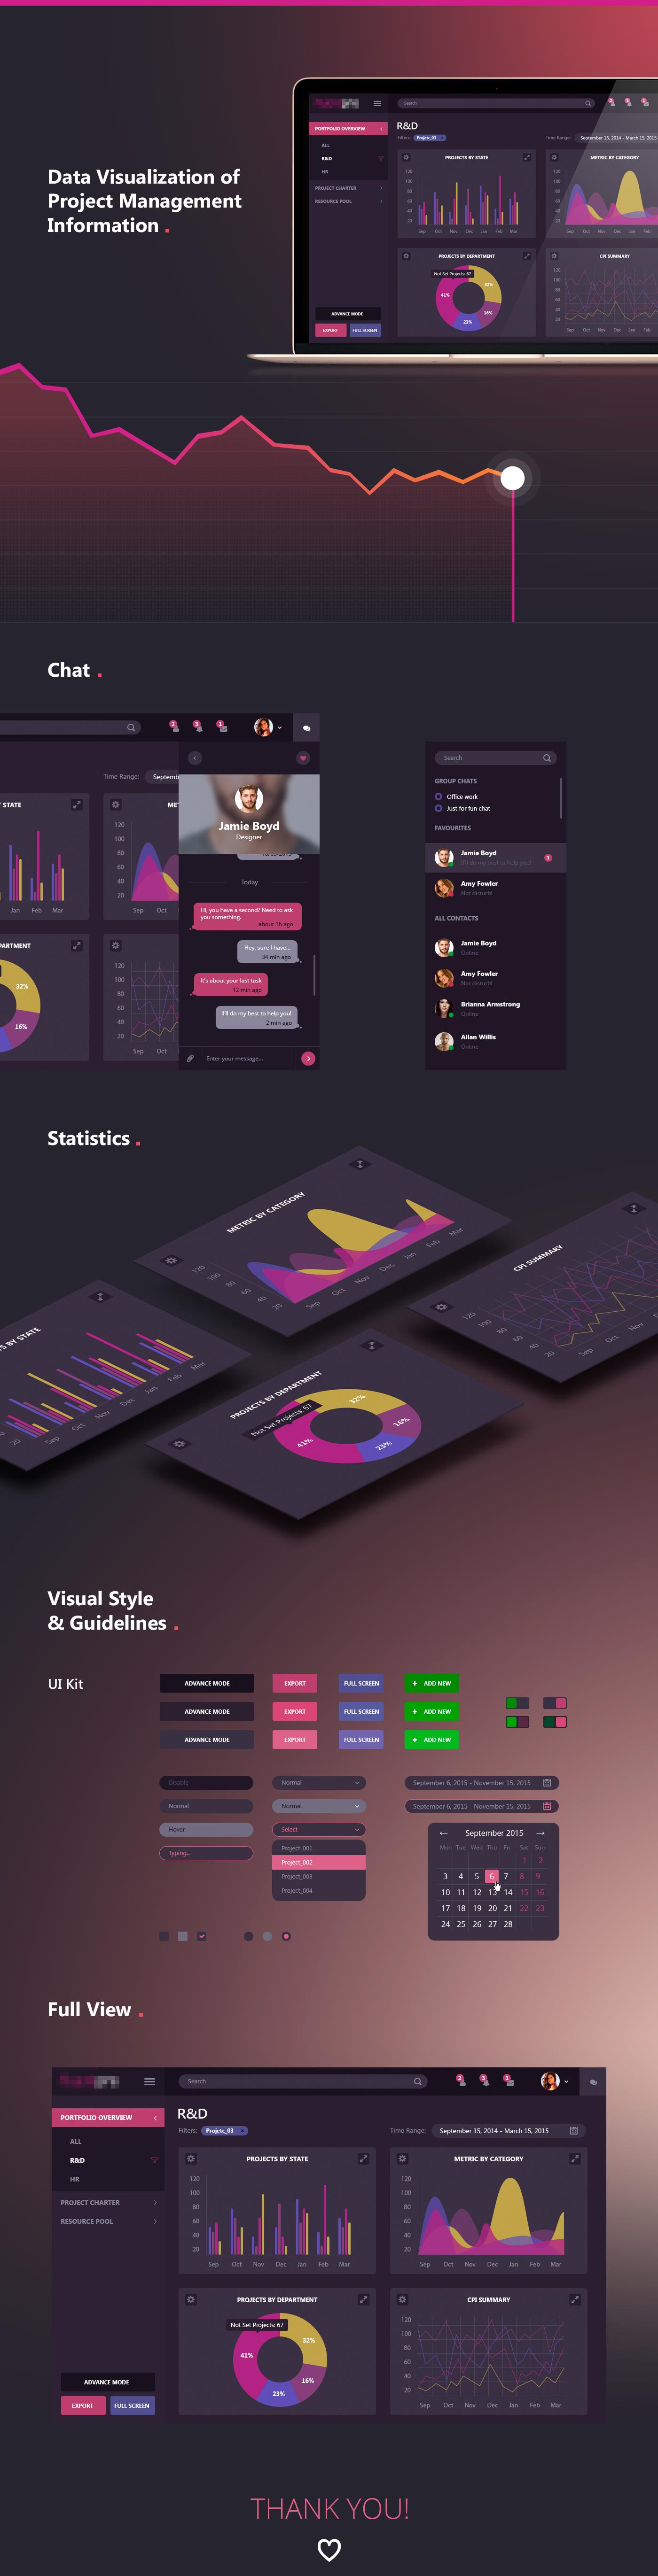 ui elements,Charts,chart,ui kit,dashboard,analytics,Graphs,UI,ux,minimal,clean